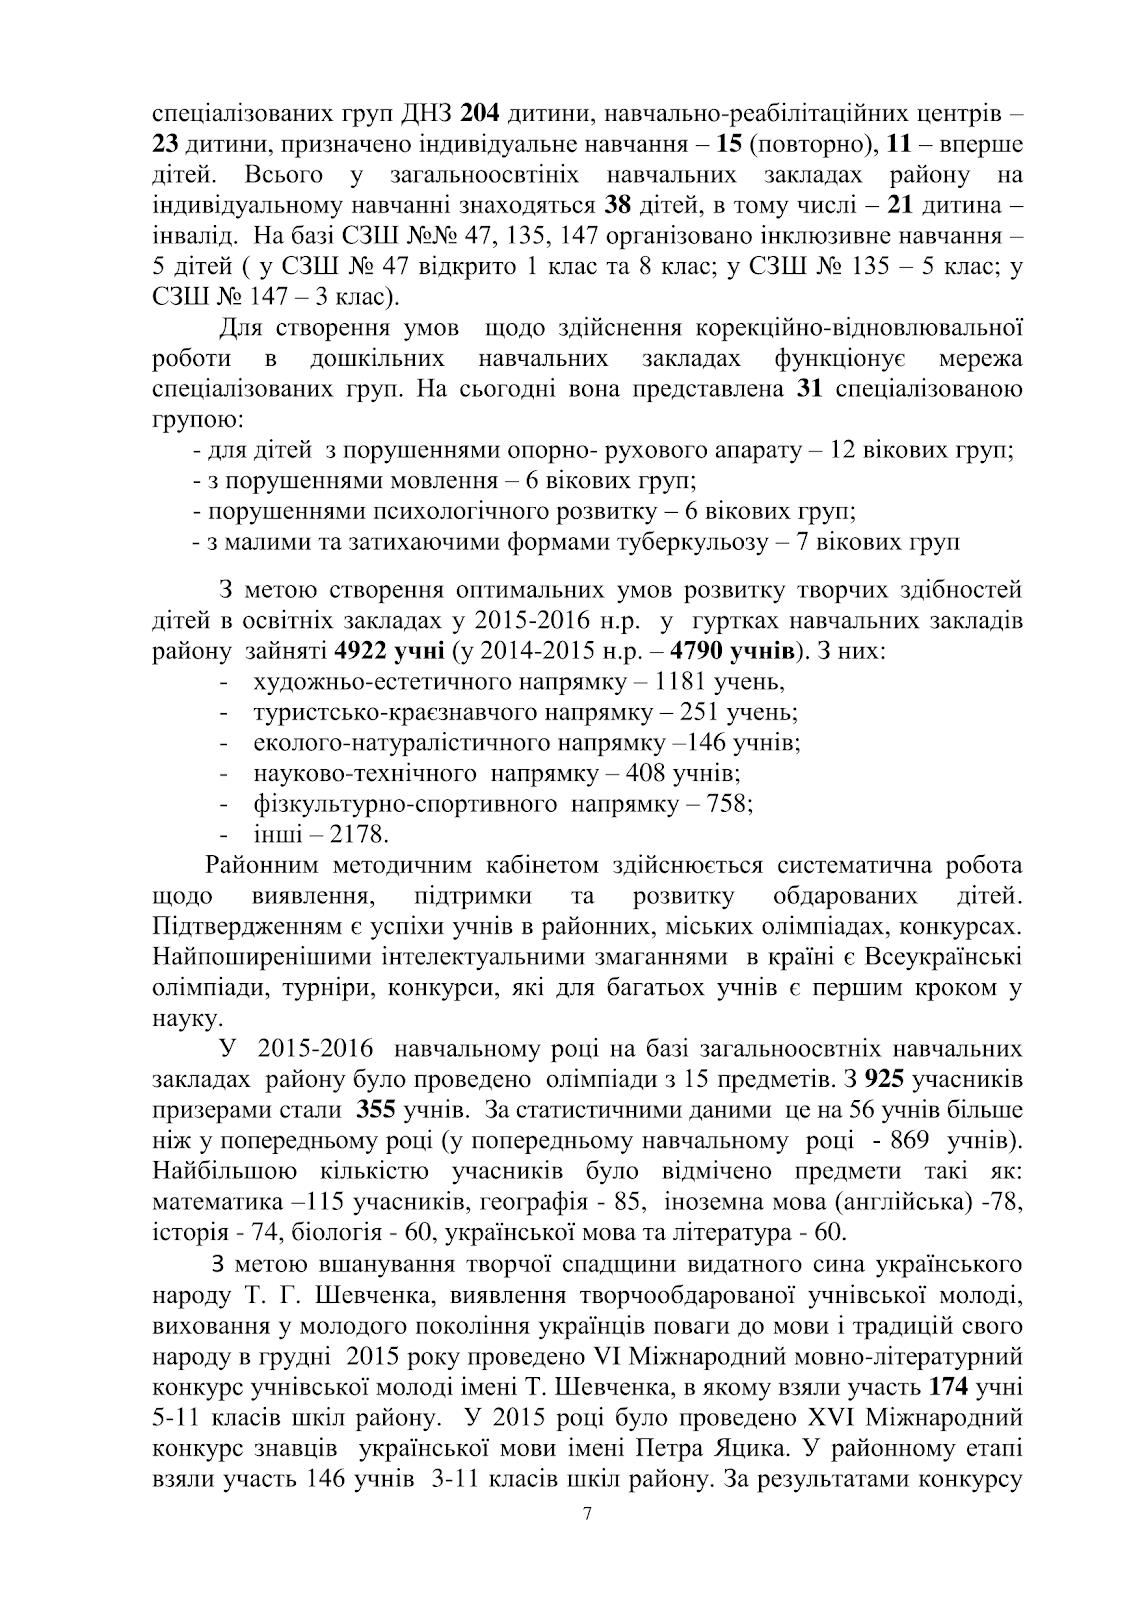 C:\Users\Валерия\Desktop\план 2016 рік\план 2016 рік-007.png